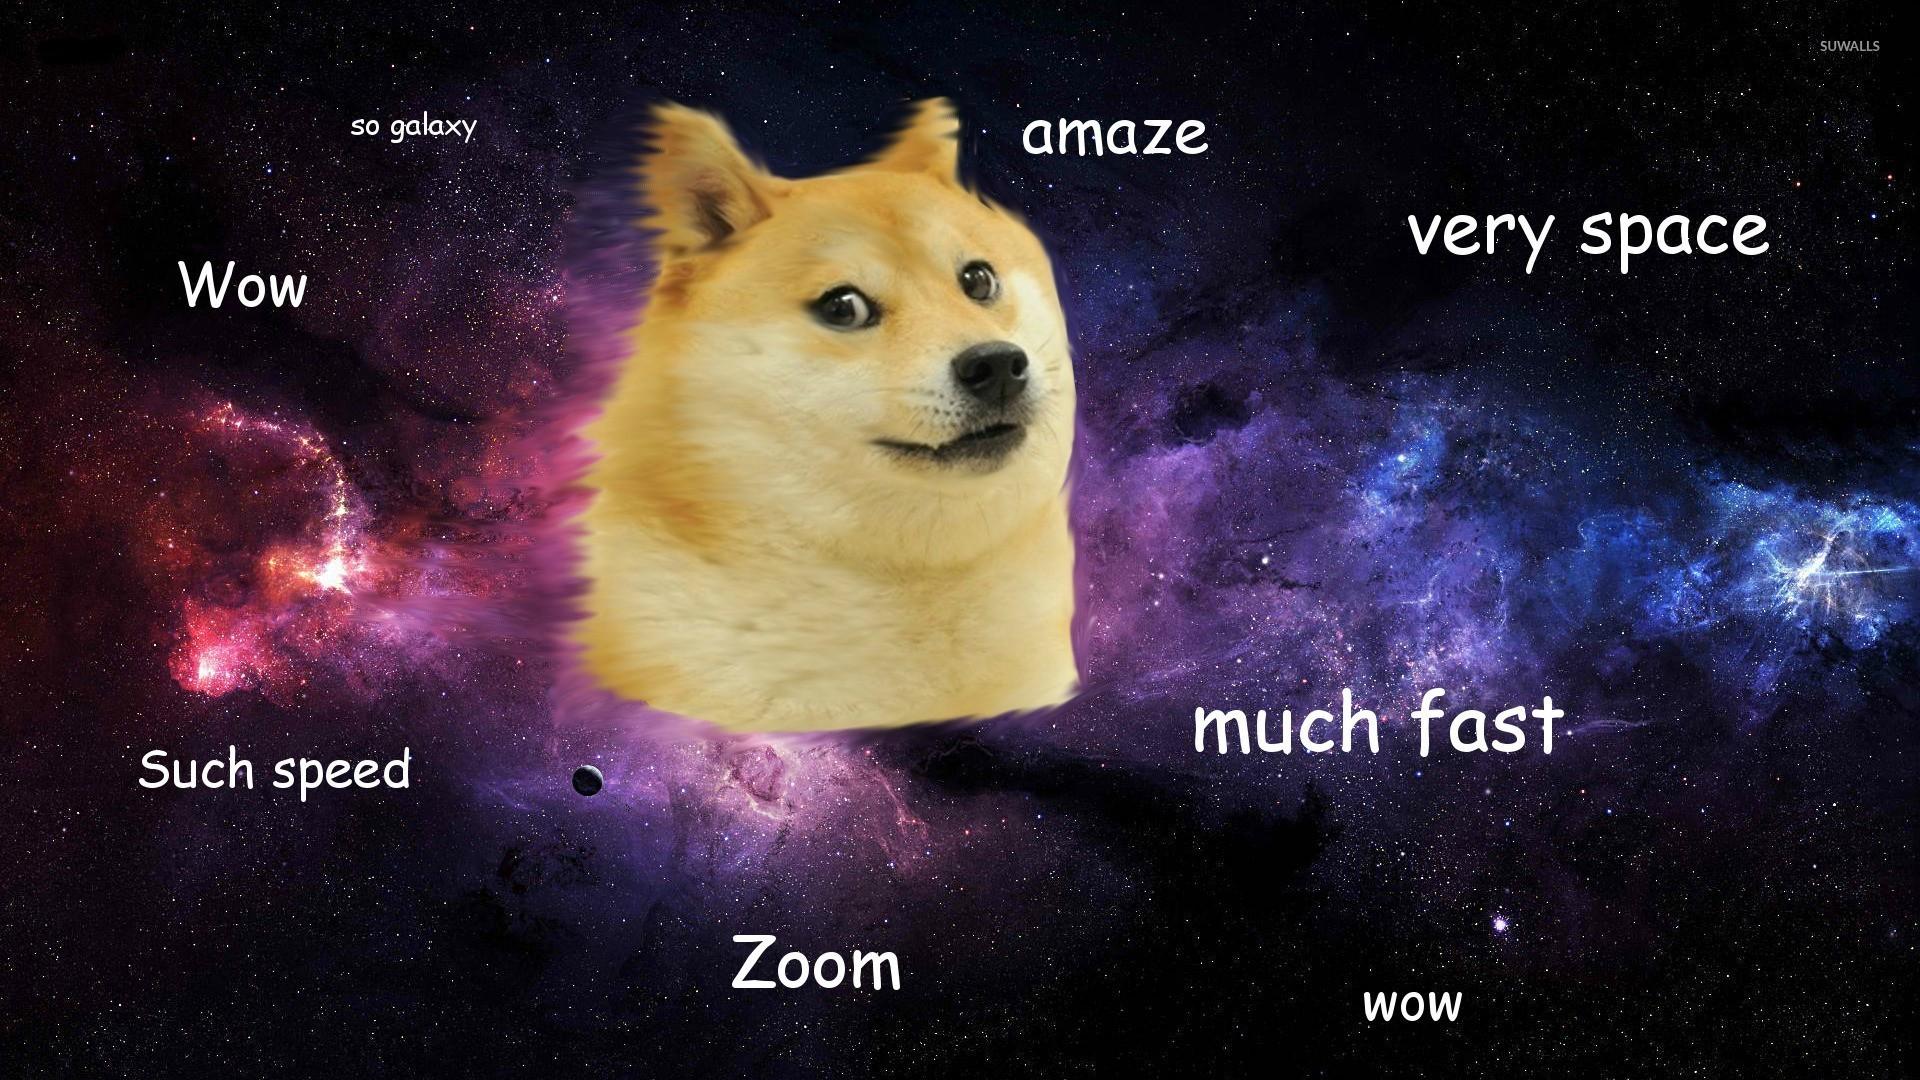 47] Doge Meme Wallpaper on WallpaperSafari 1920x1080